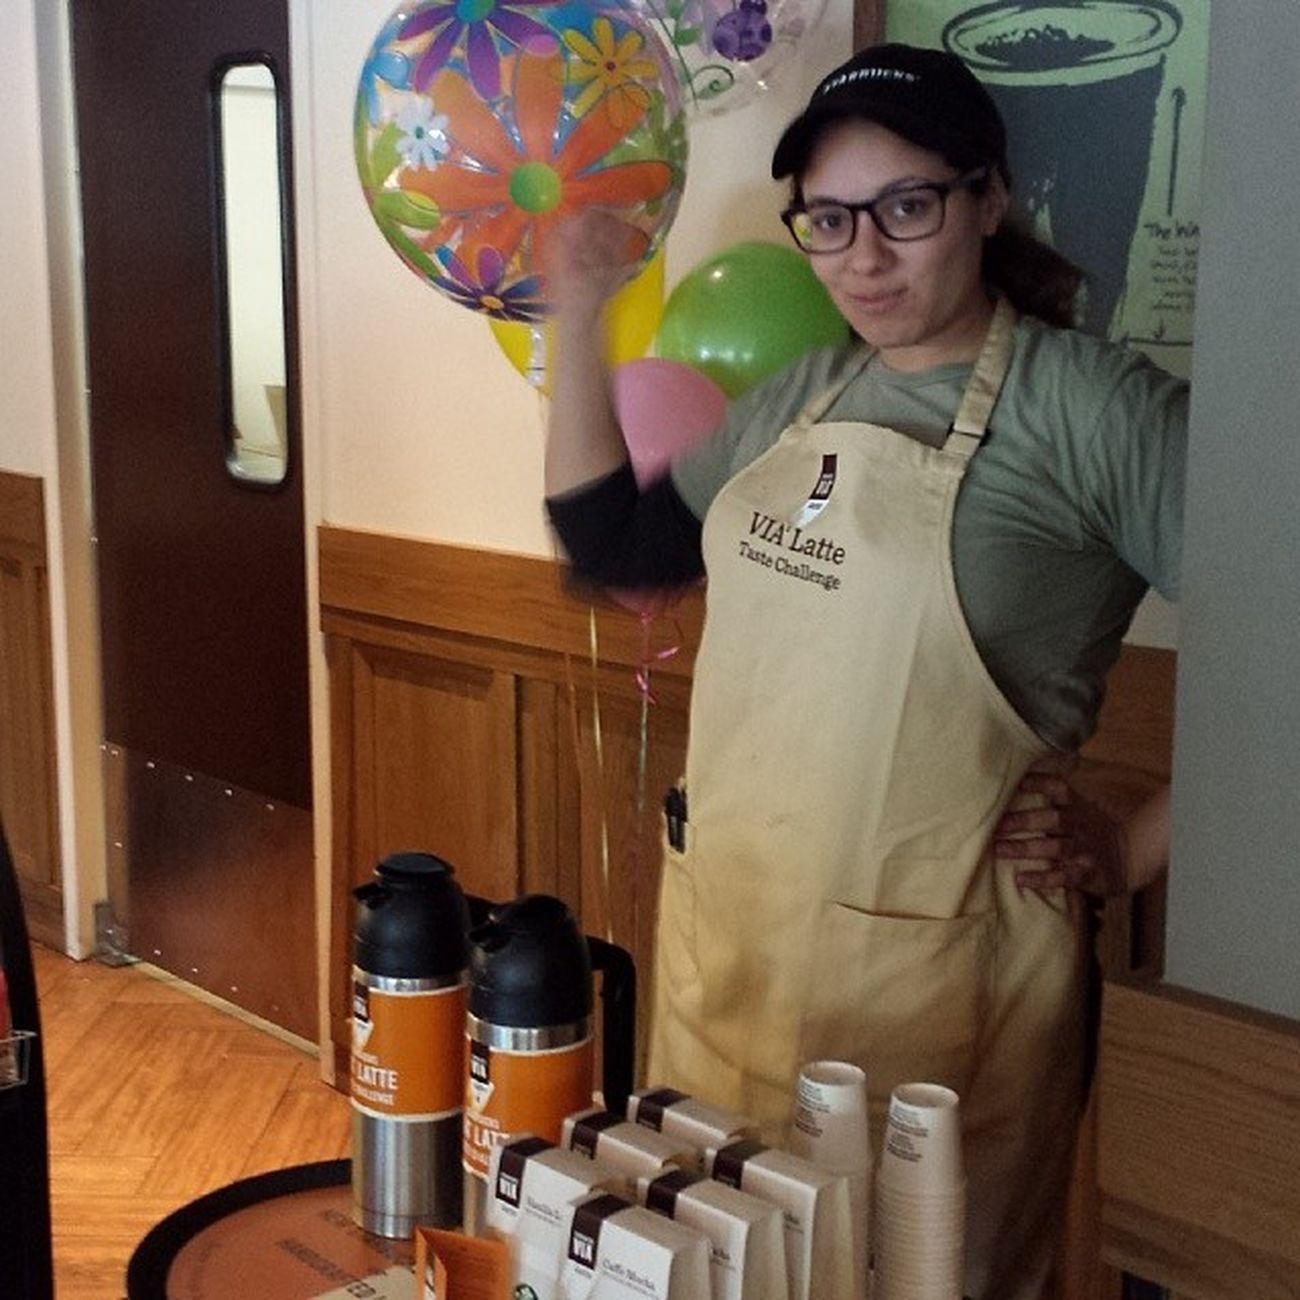 Viatastechallange Pleasedonthateme Loveyoushaun Starbucks baristalife